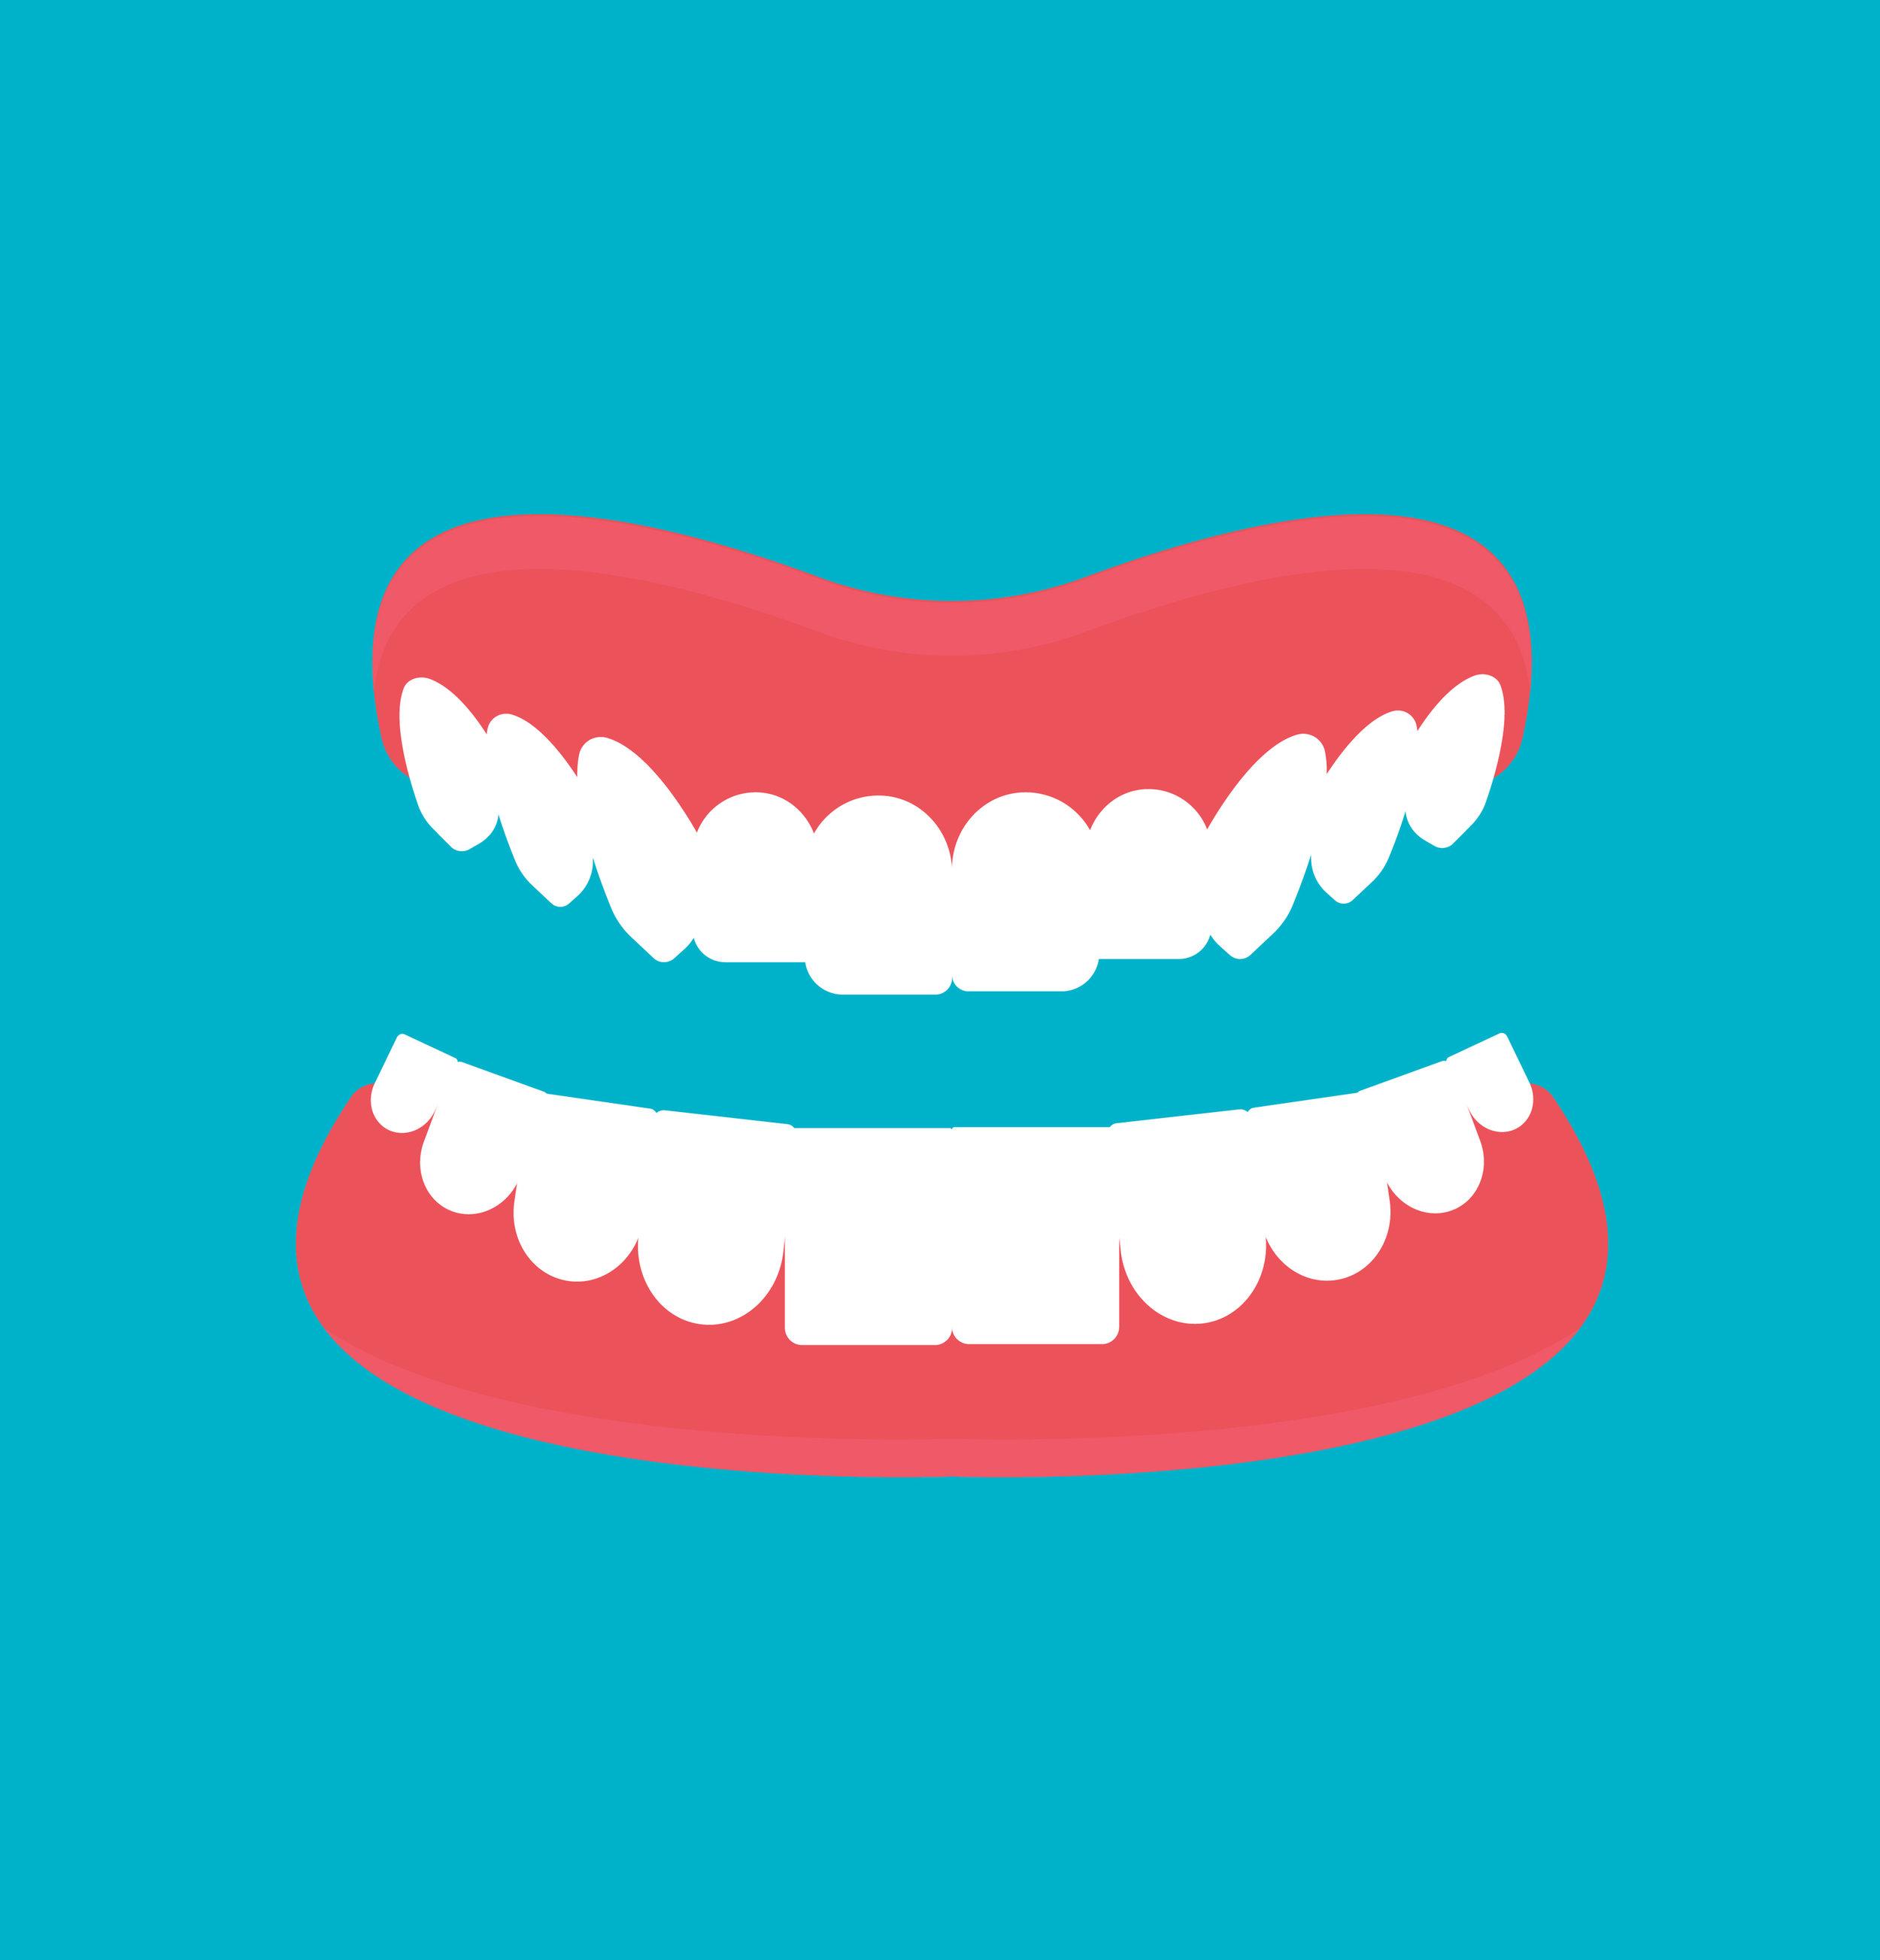 Dental Implant Cartoon Smile